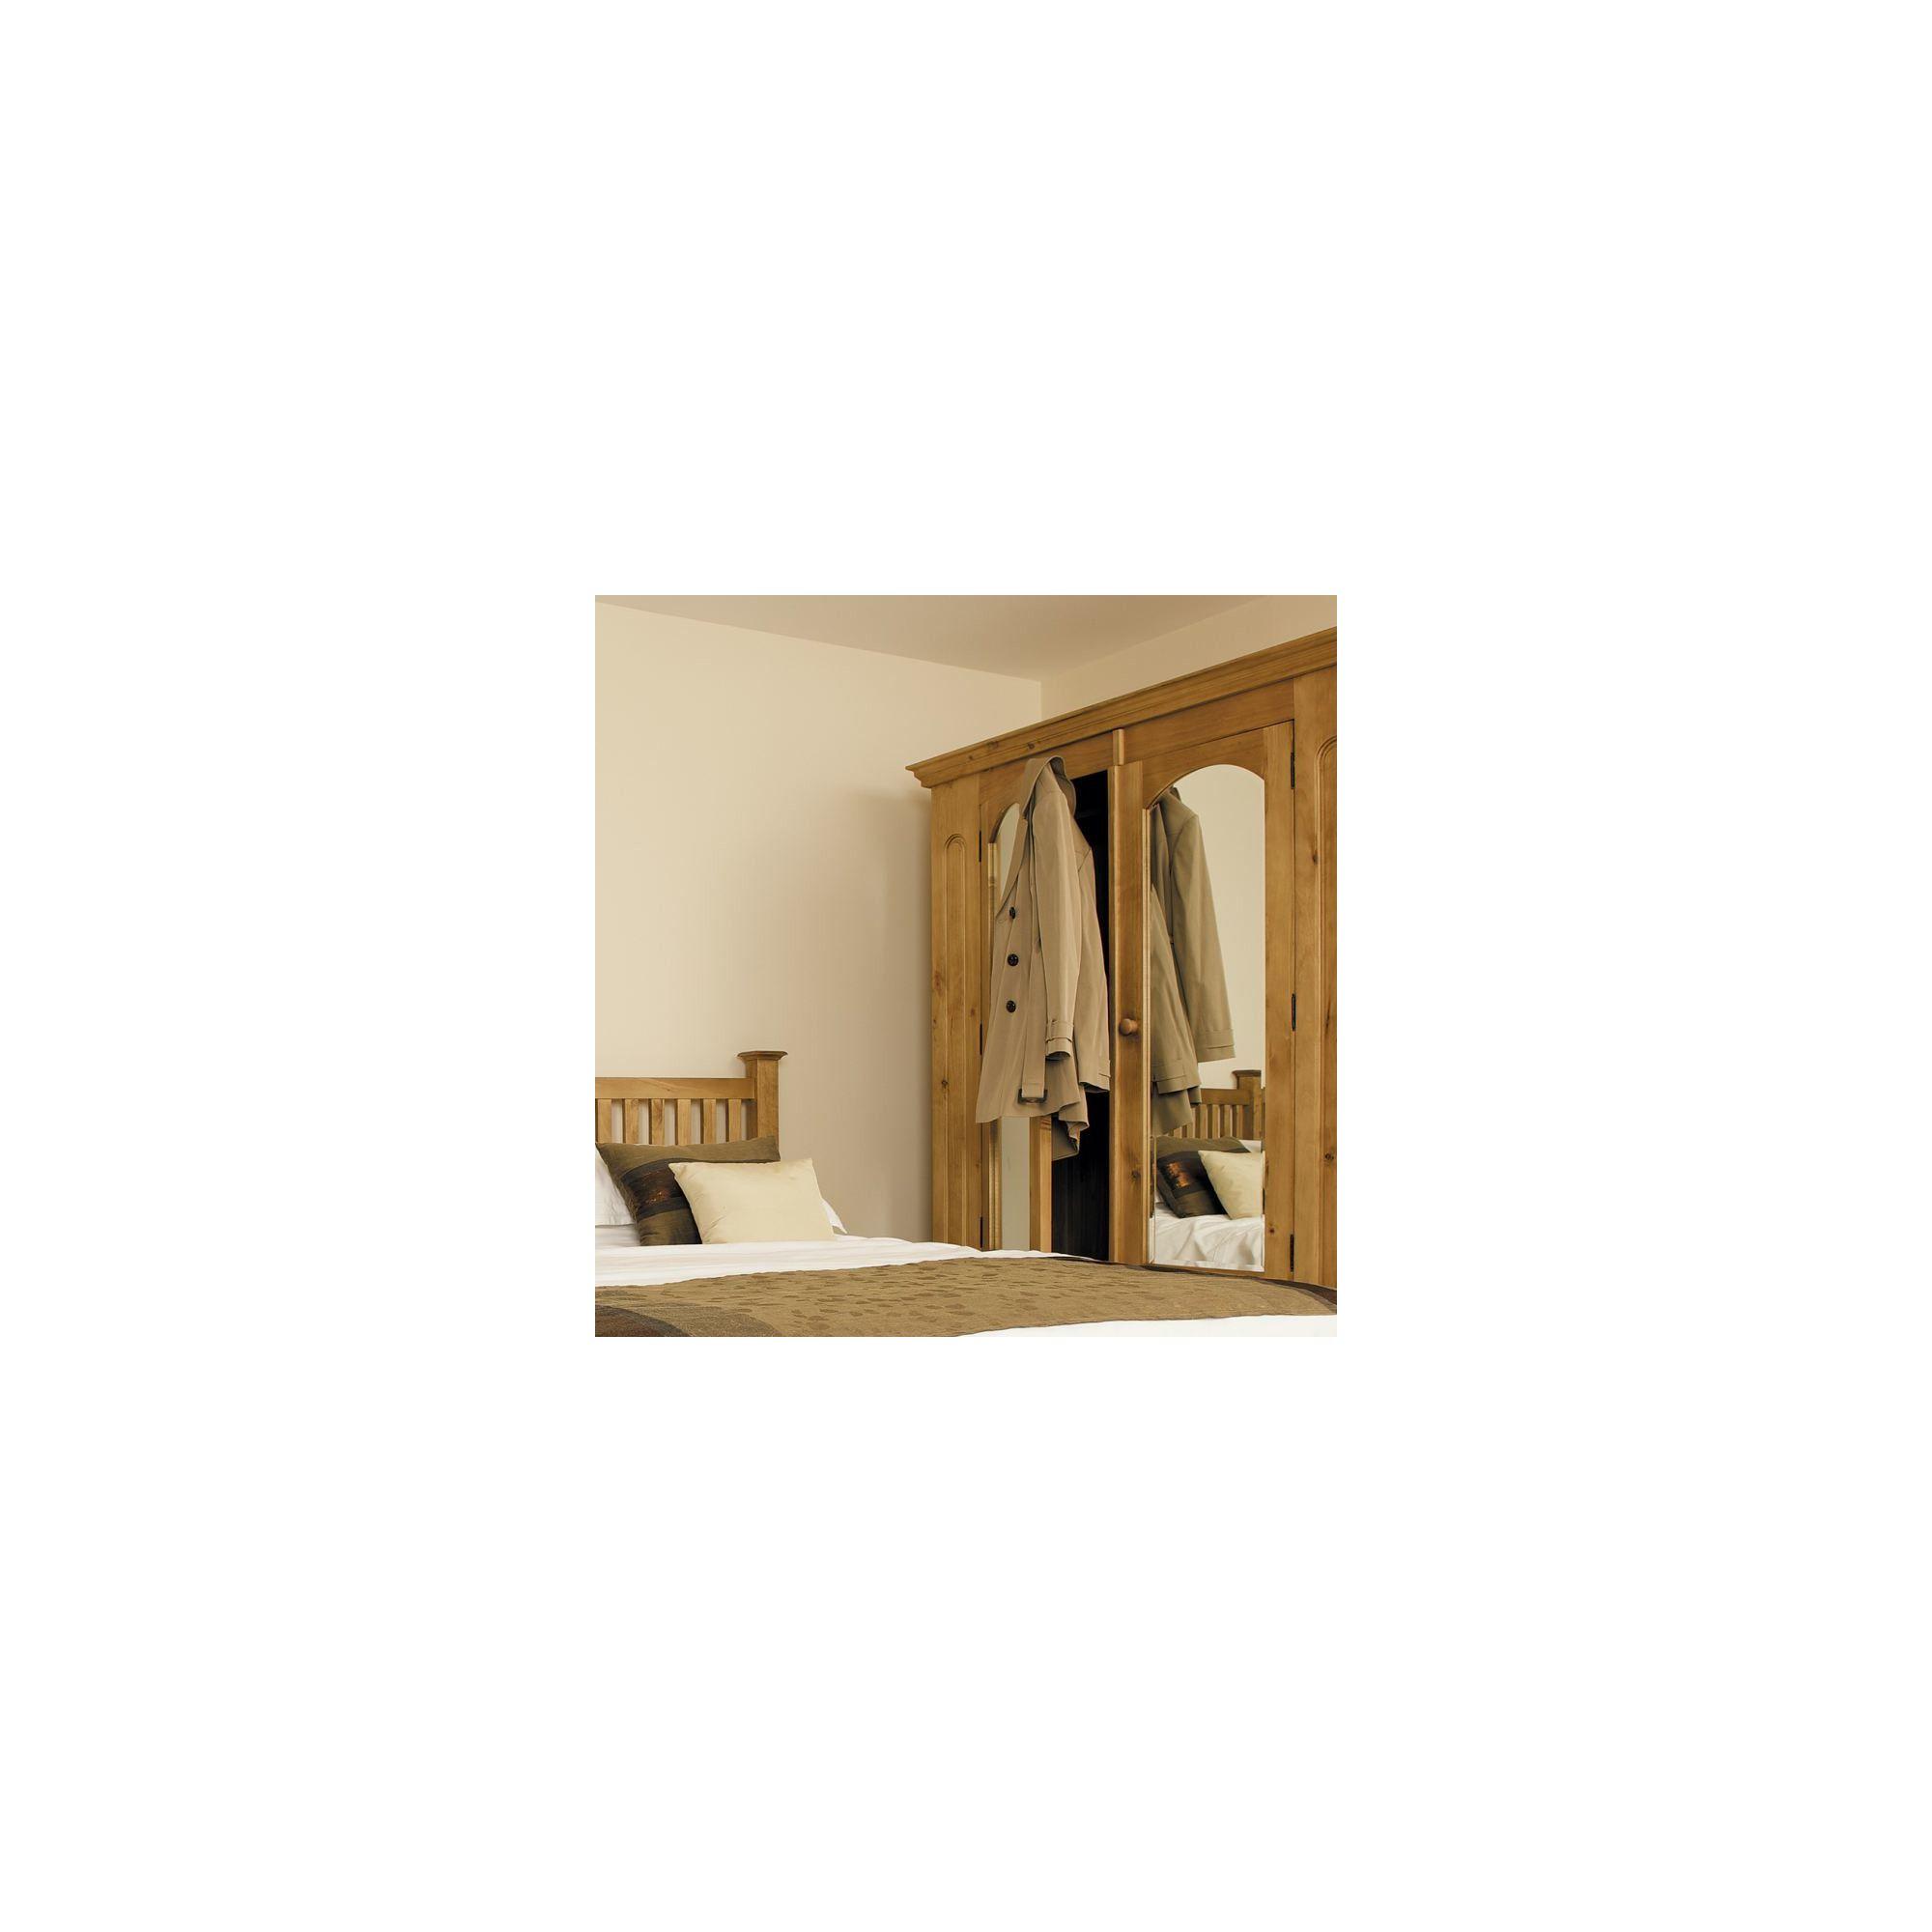 Kelburn Furniture Woodland Pine 2 Door Wardrobe with Mirror at Tesco Direct